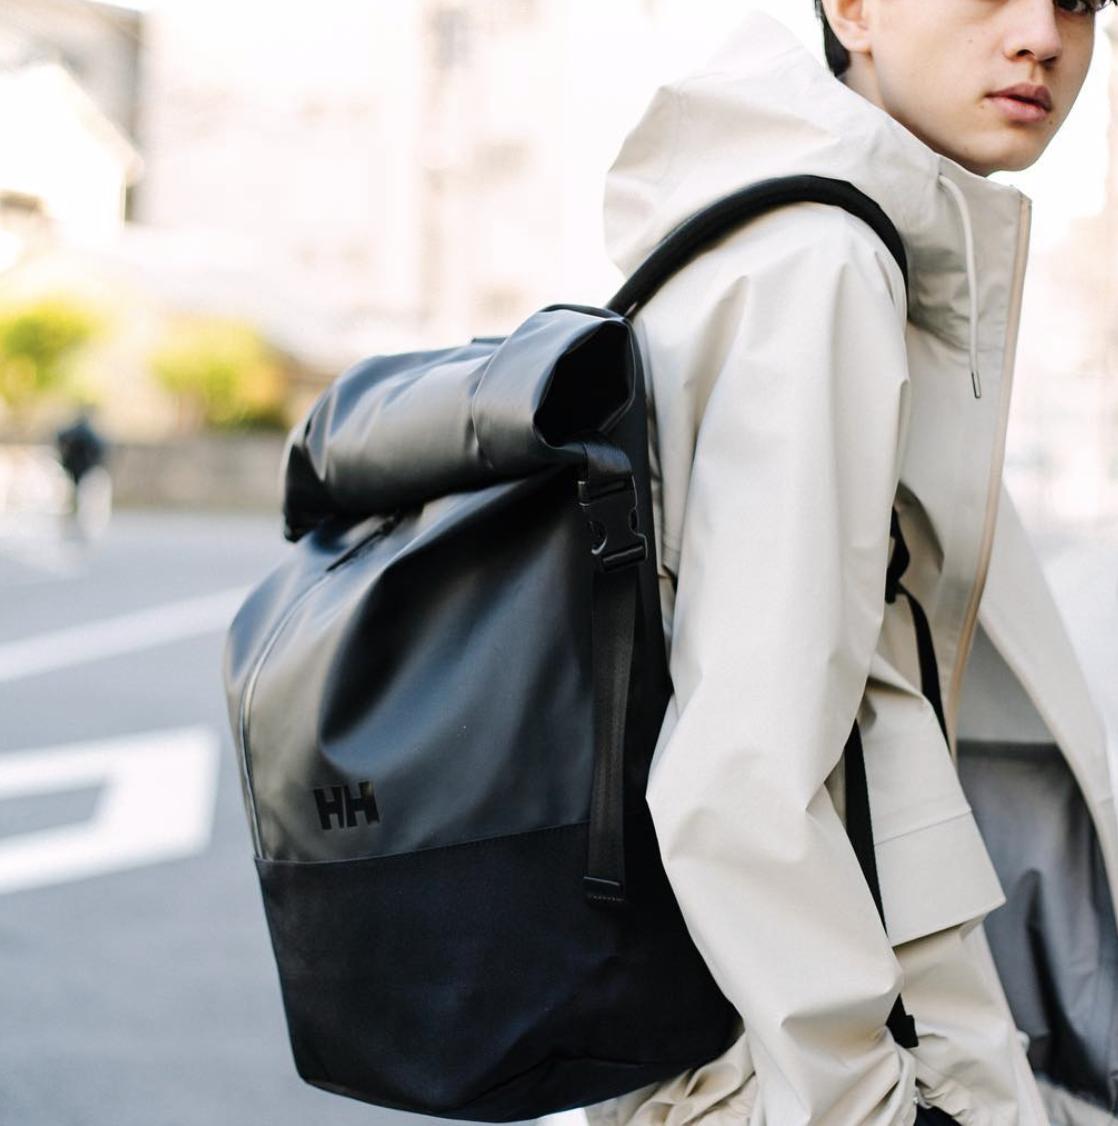 f:id:thebackpack:20190517143758p:plain